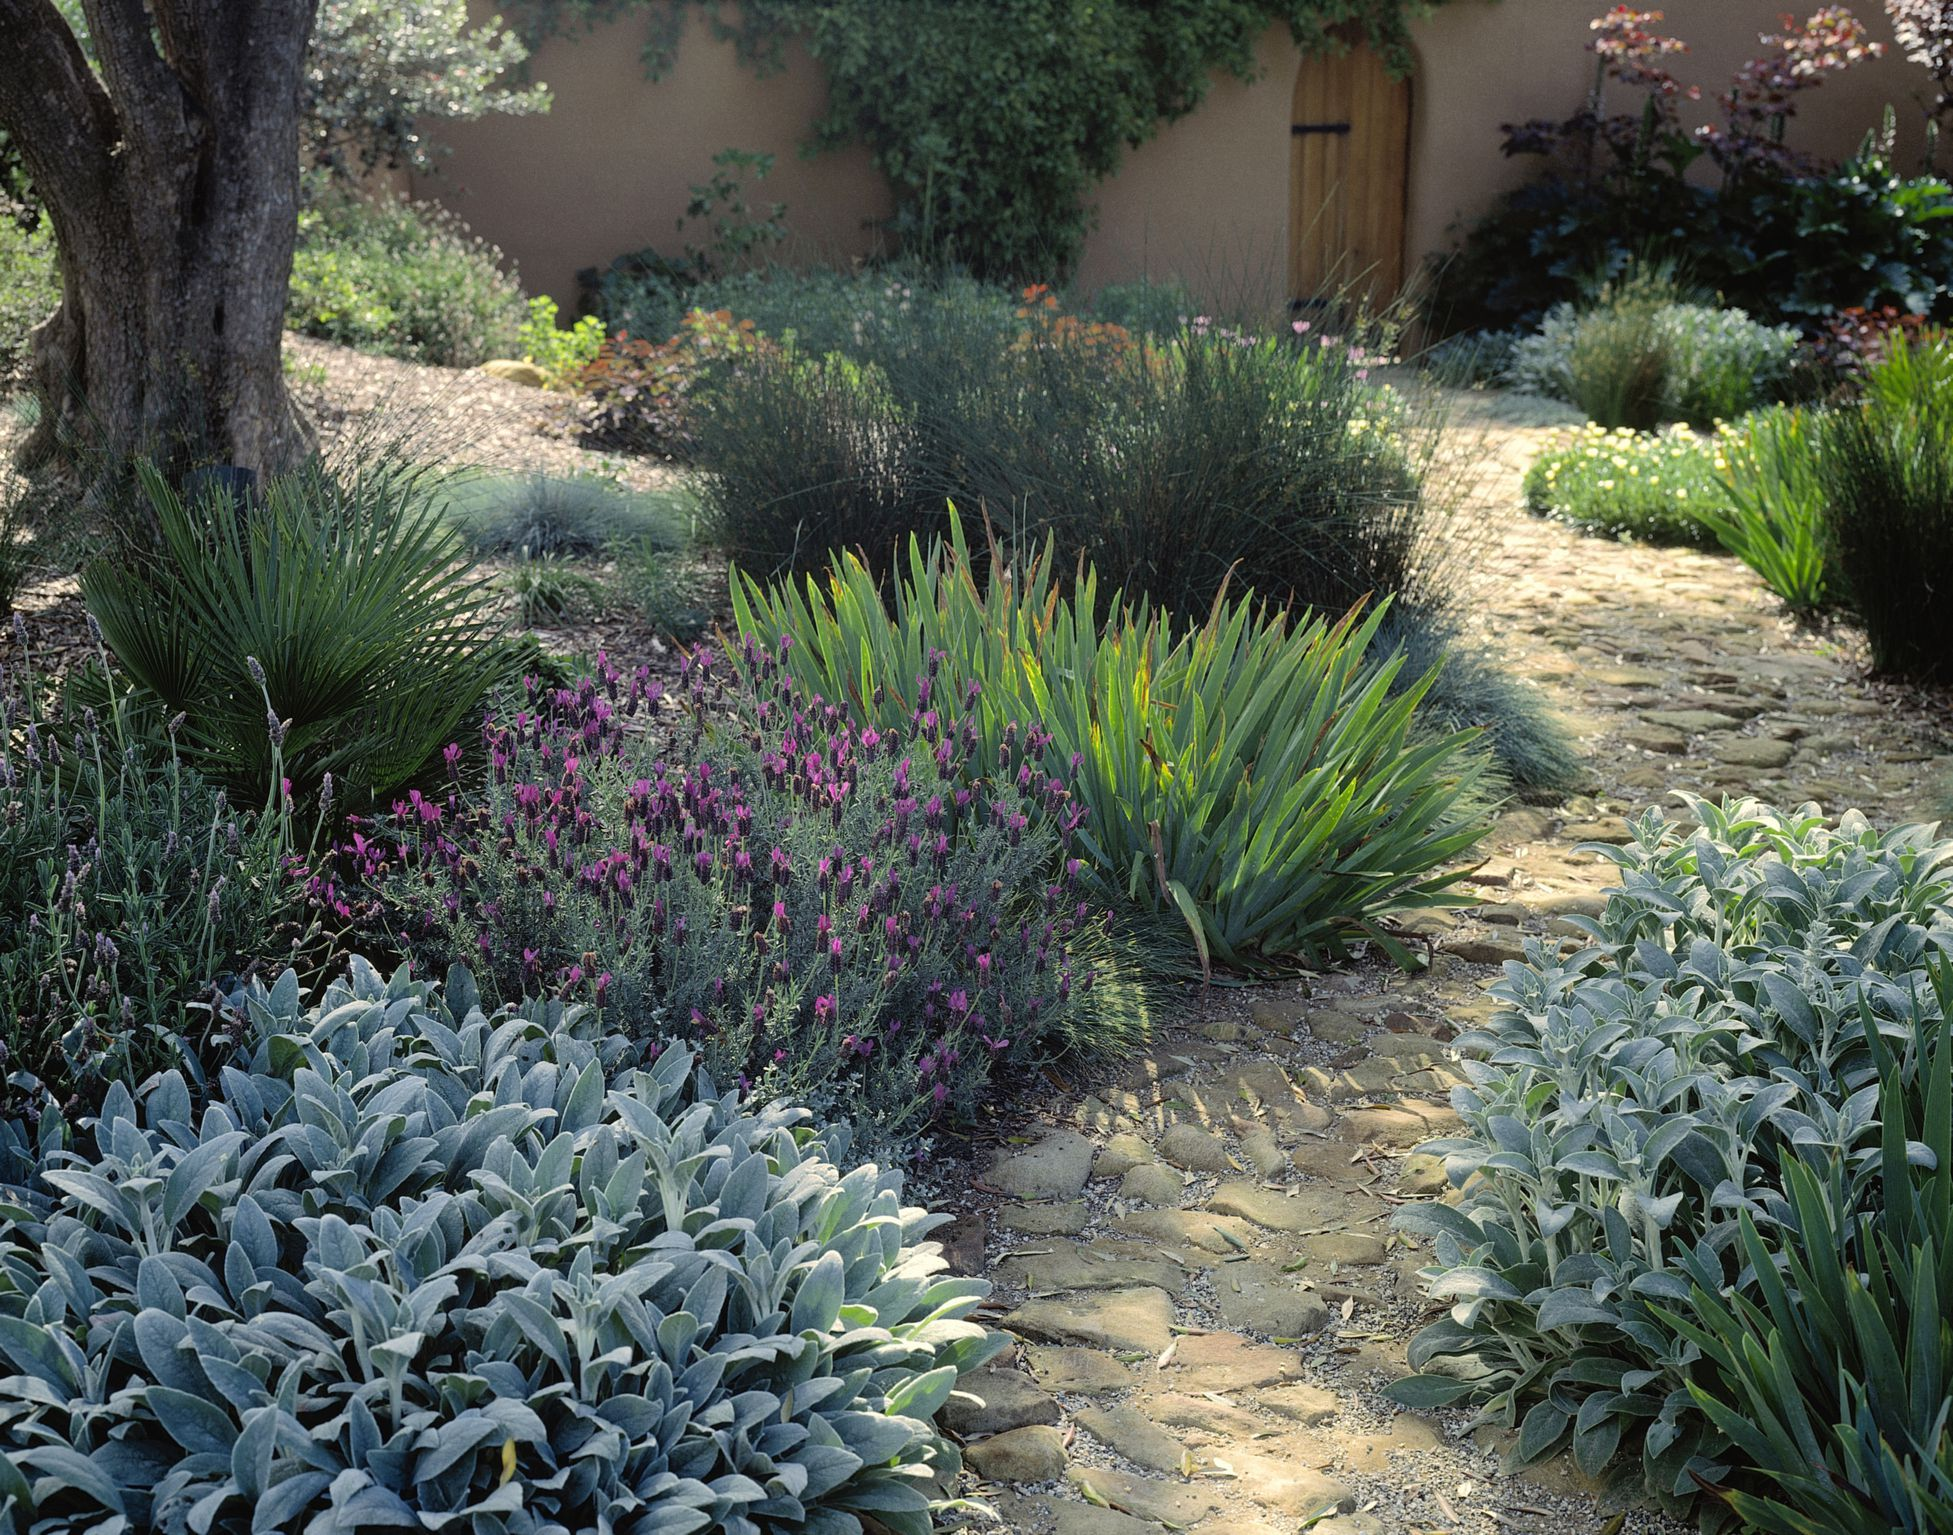 using plants for texture in garden design - Garden Design Basics